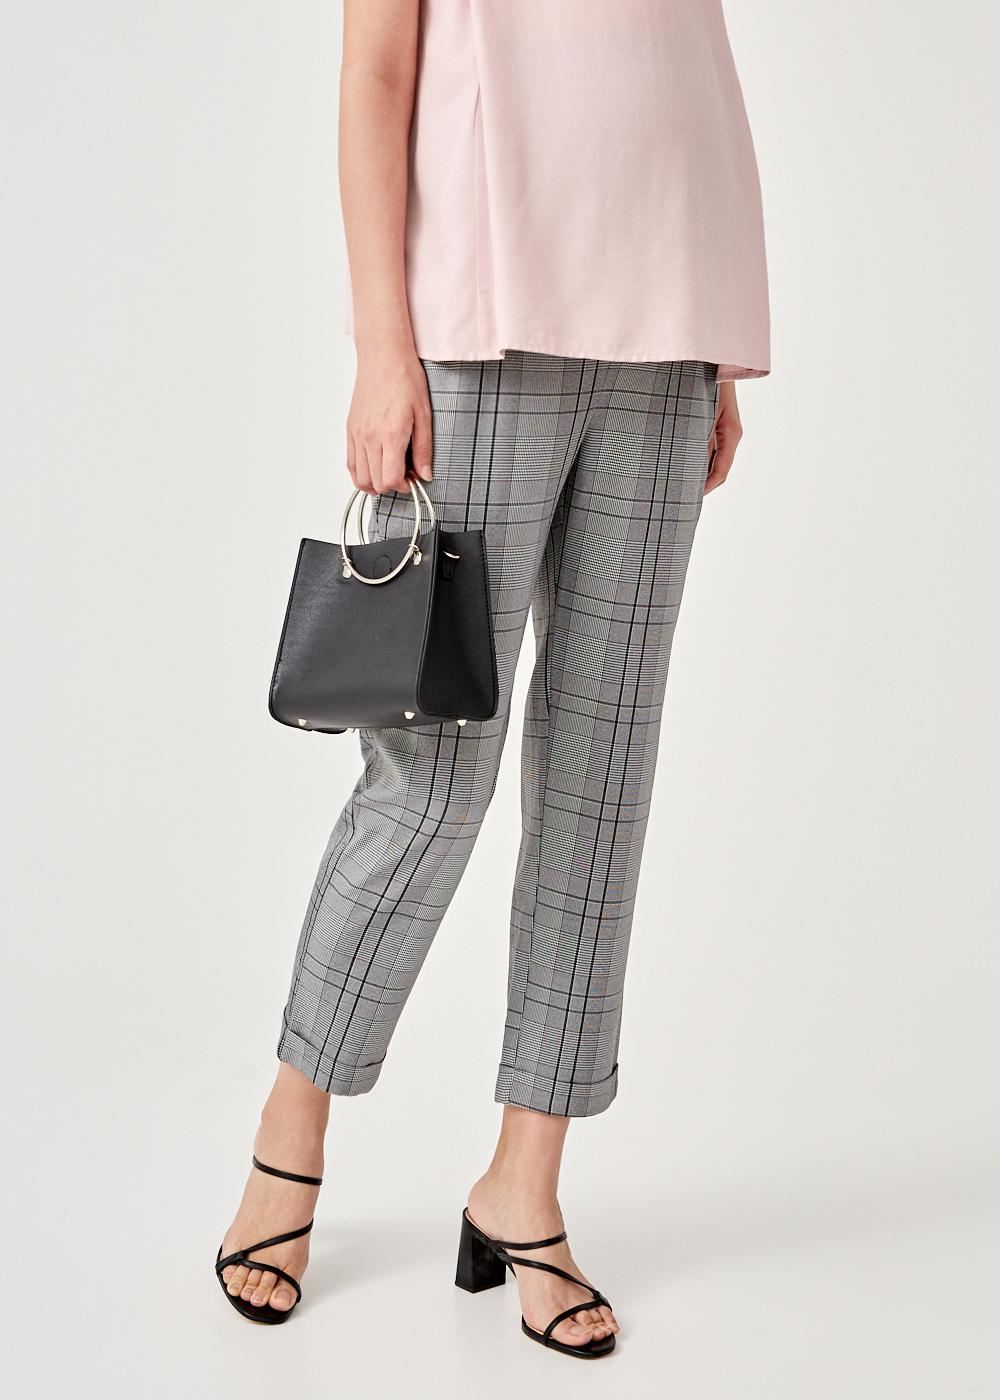 Iyana Elastic Waist Peg Pants